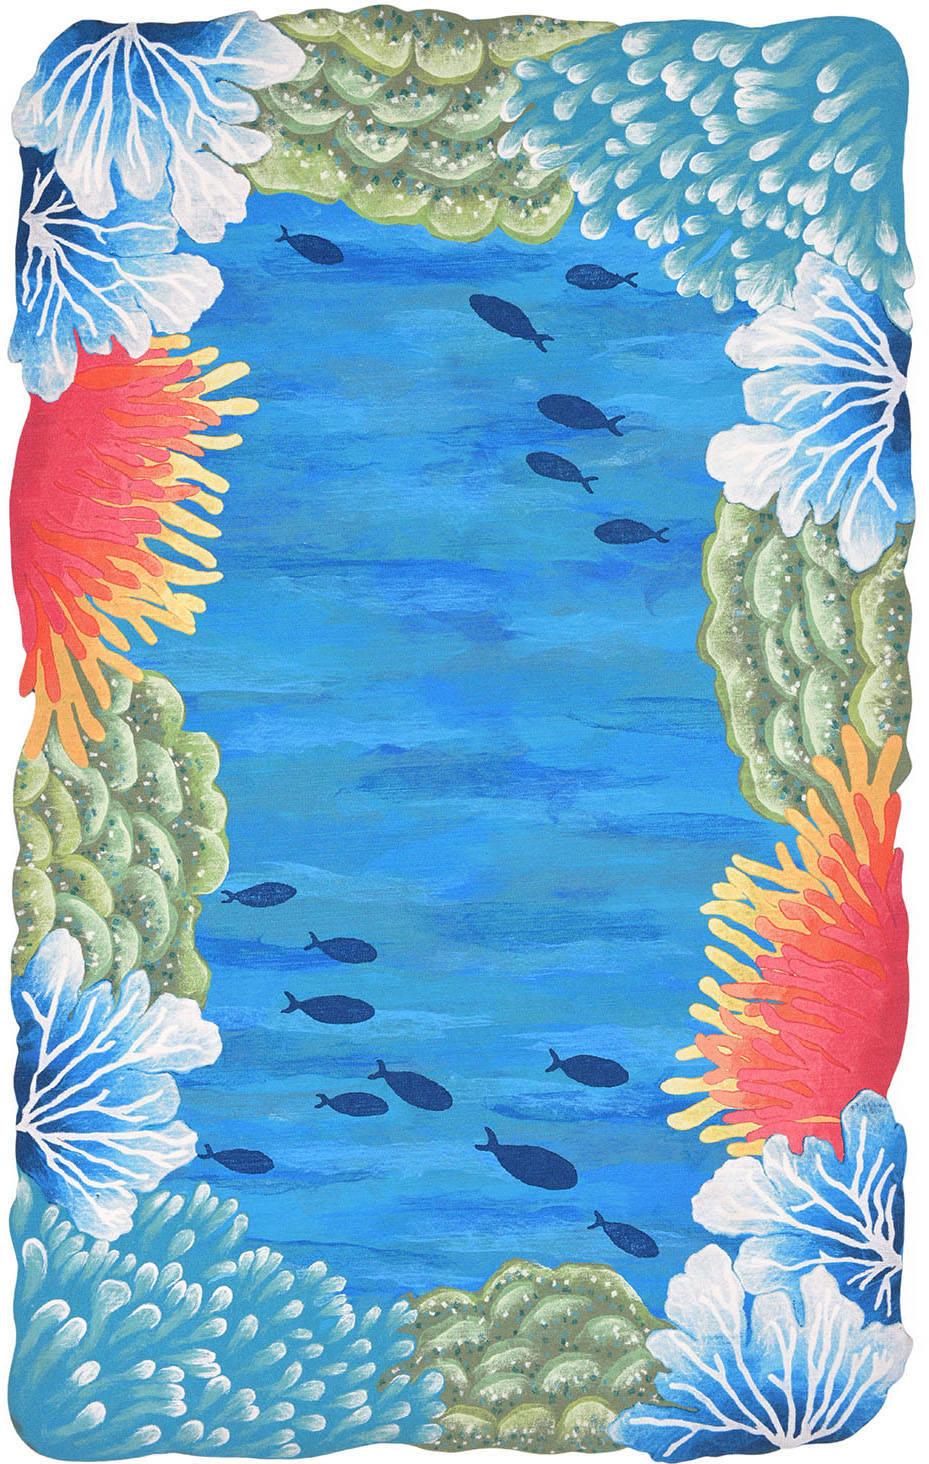 Trans Ocean Visions Iv Reef Border 413703 Blue Rug Studio